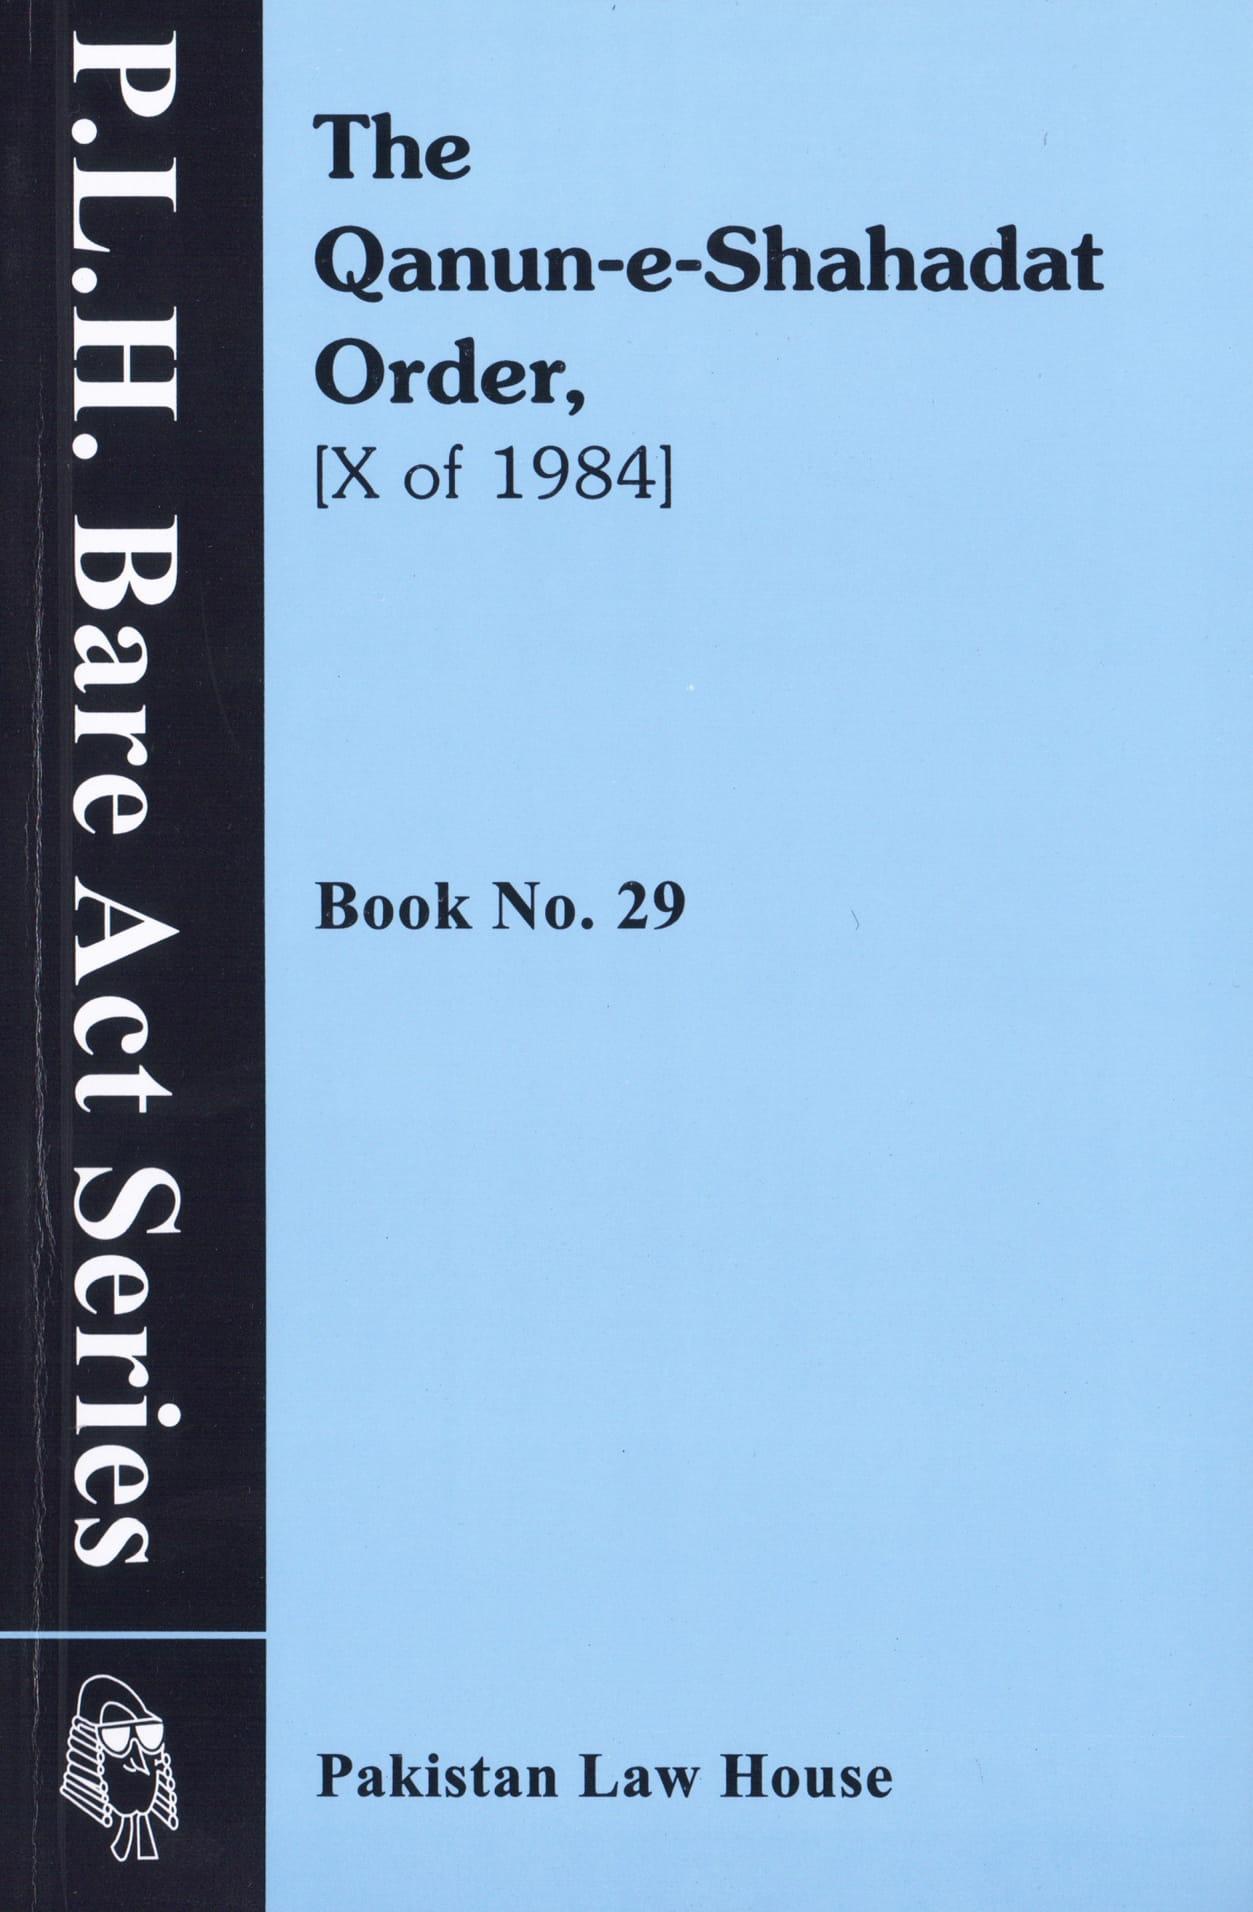 The Qanun E Shahadat Order, 1884